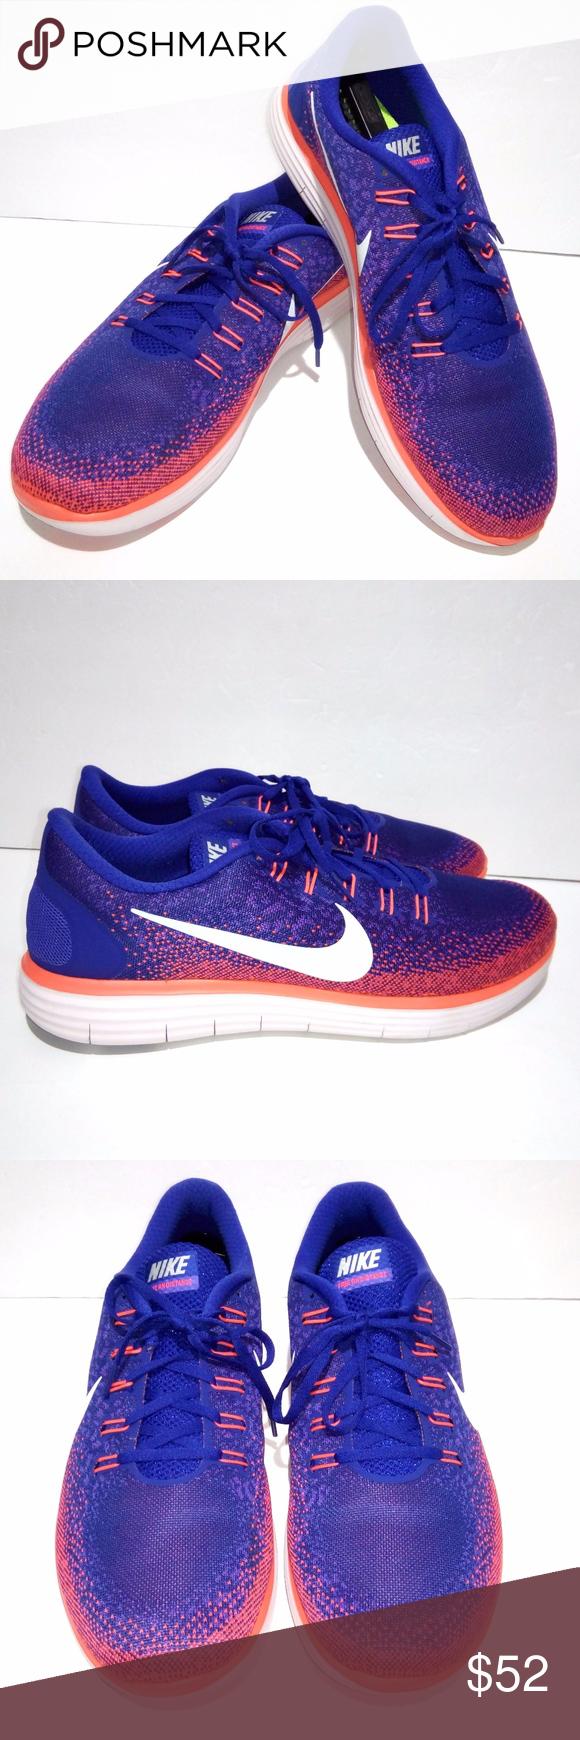 986f5f9350a73 Nike Free RN Distance 14 Orange Blue Running Shoes Nike Free RN Distance  Men s Size